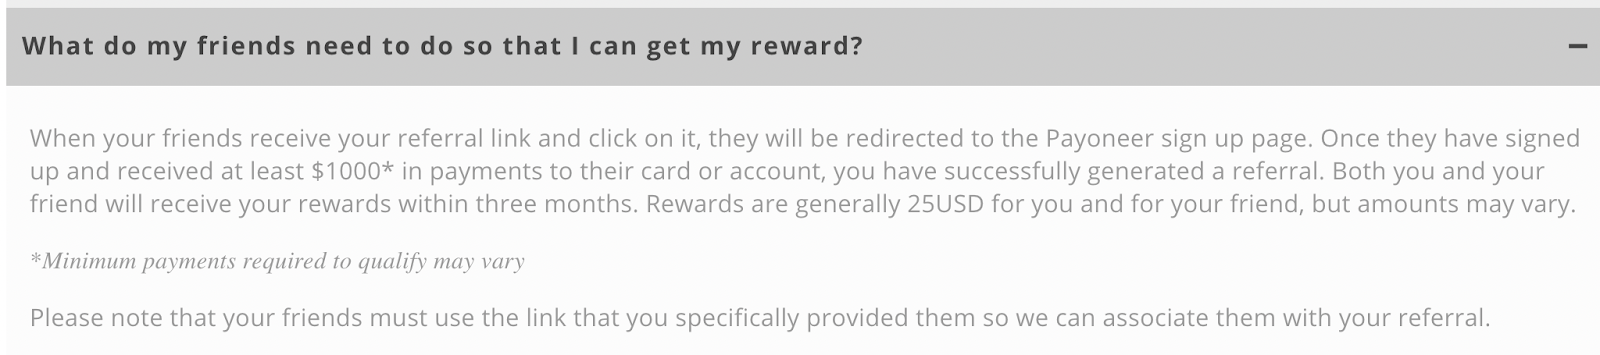 payoneer referral program faq